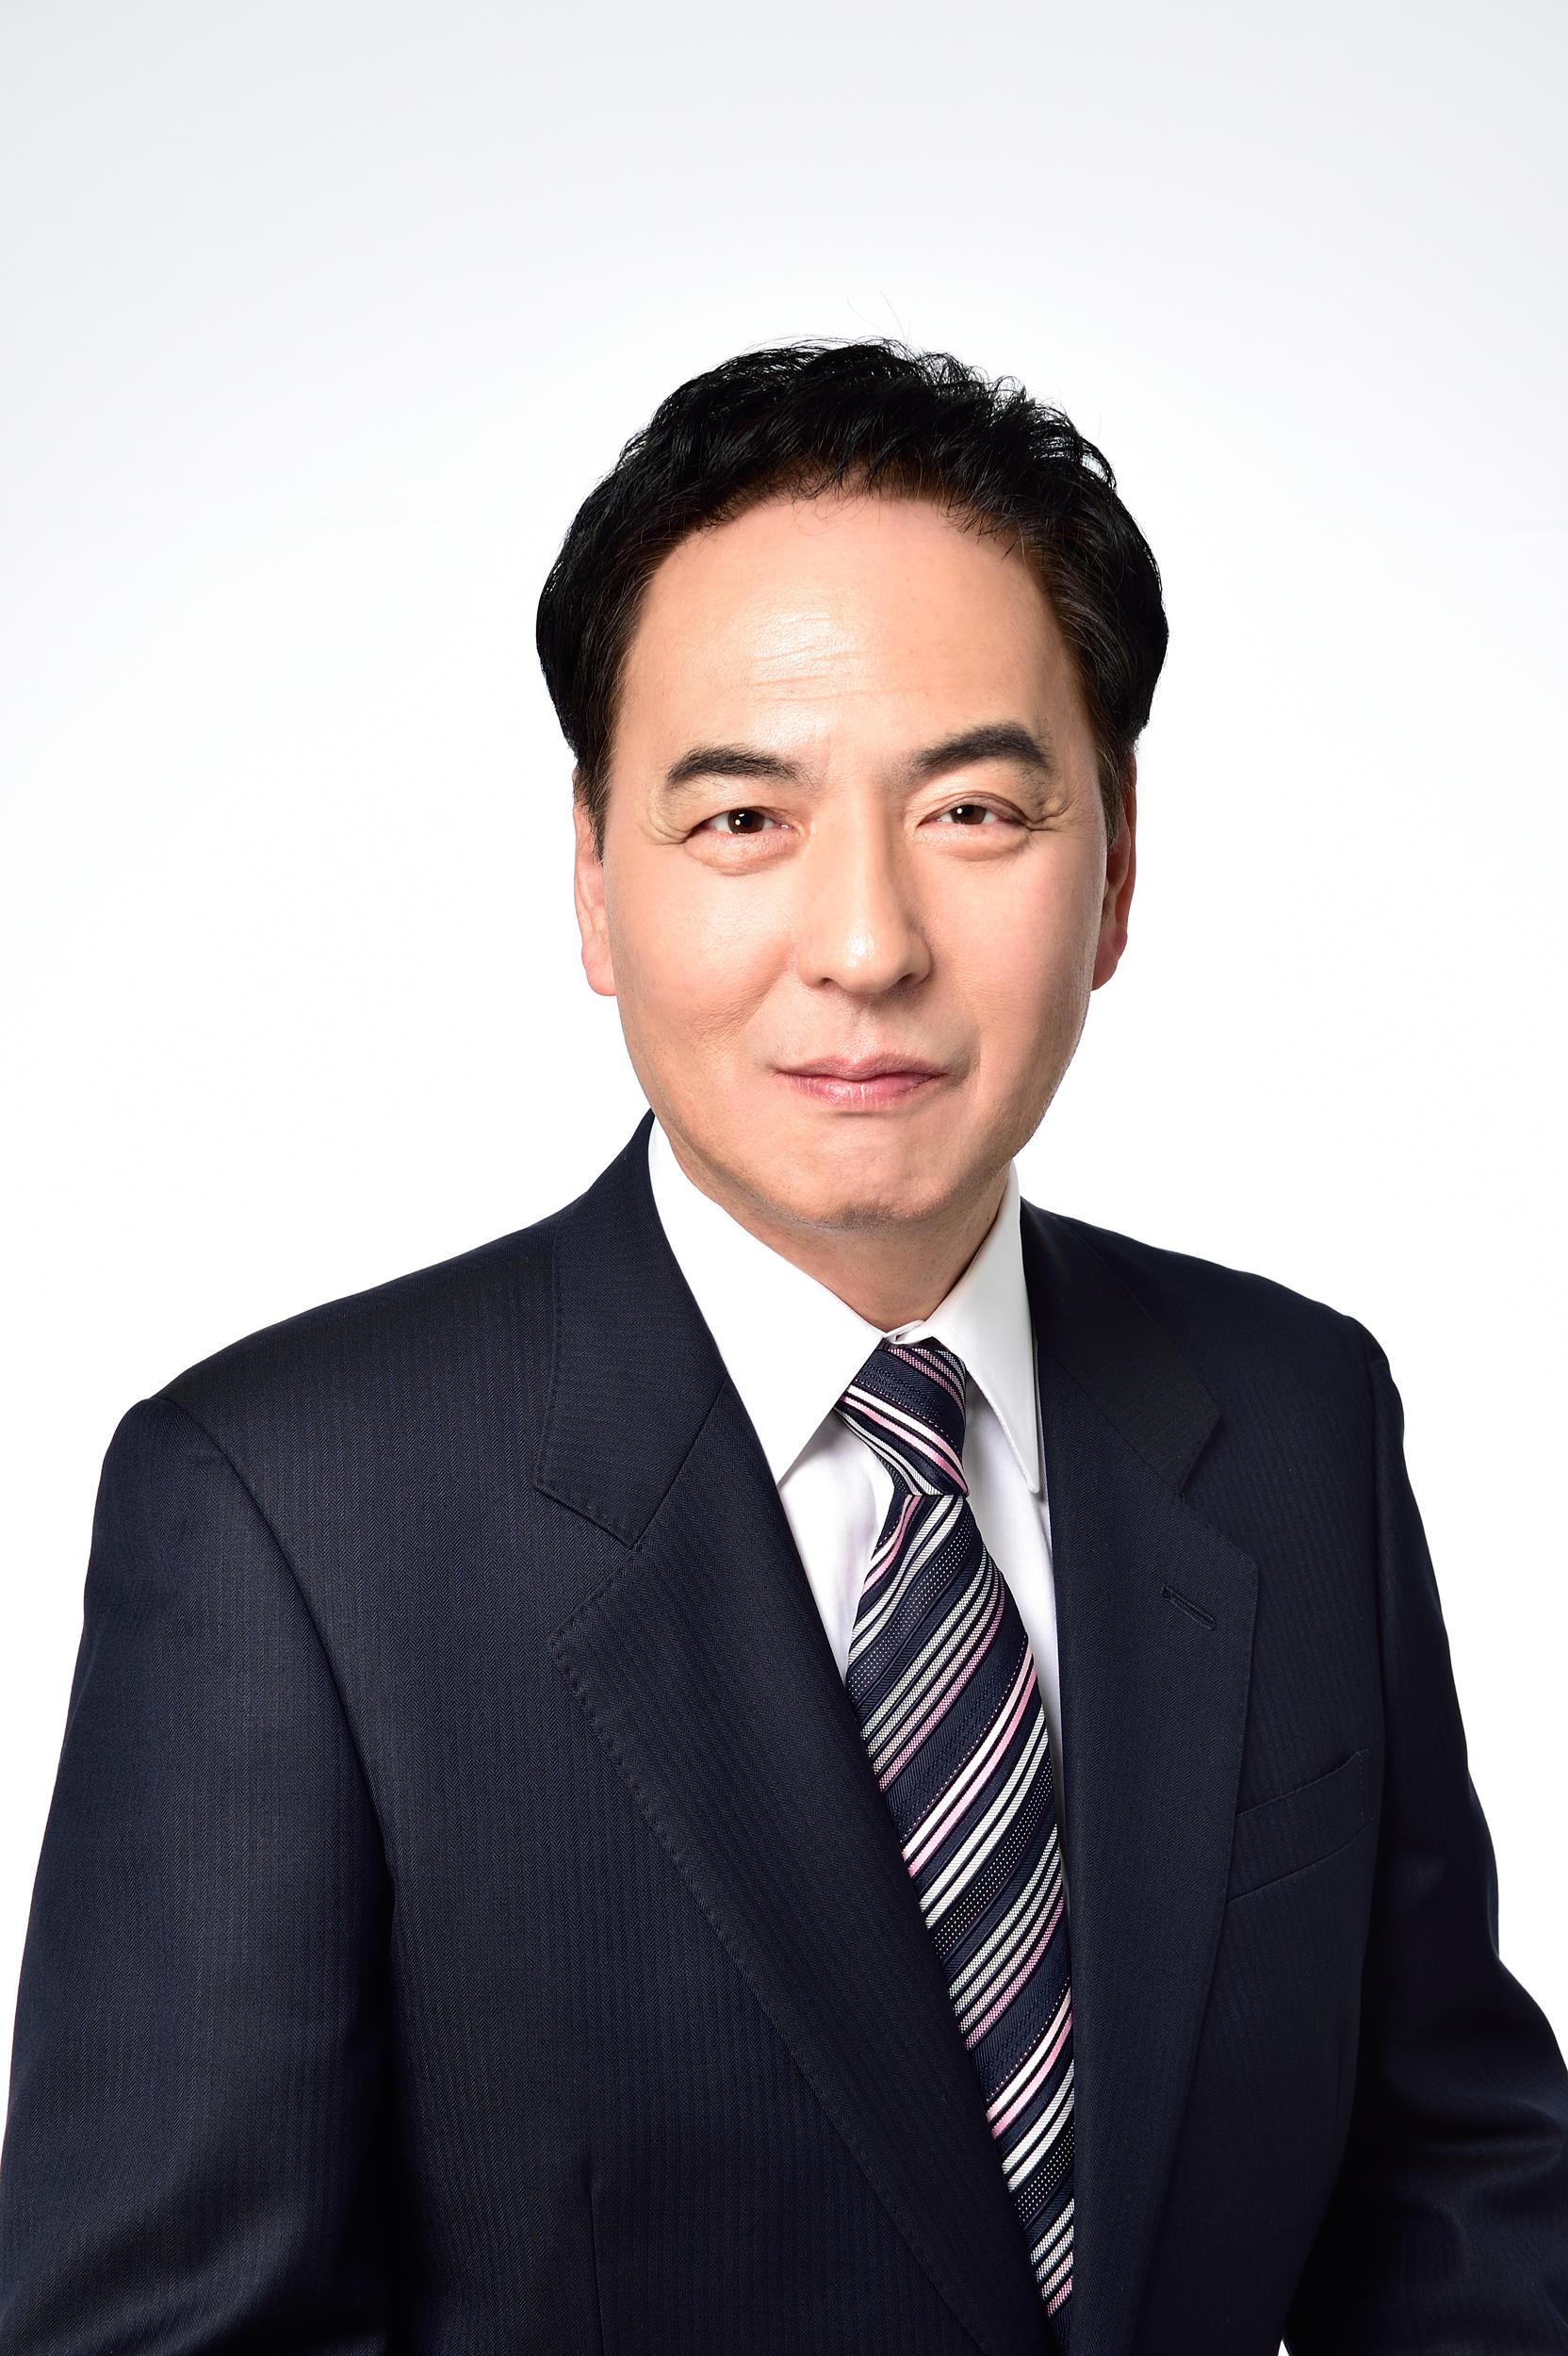 NHK「日曜討論」浅田均政務調査会長 生出演のお知らせ